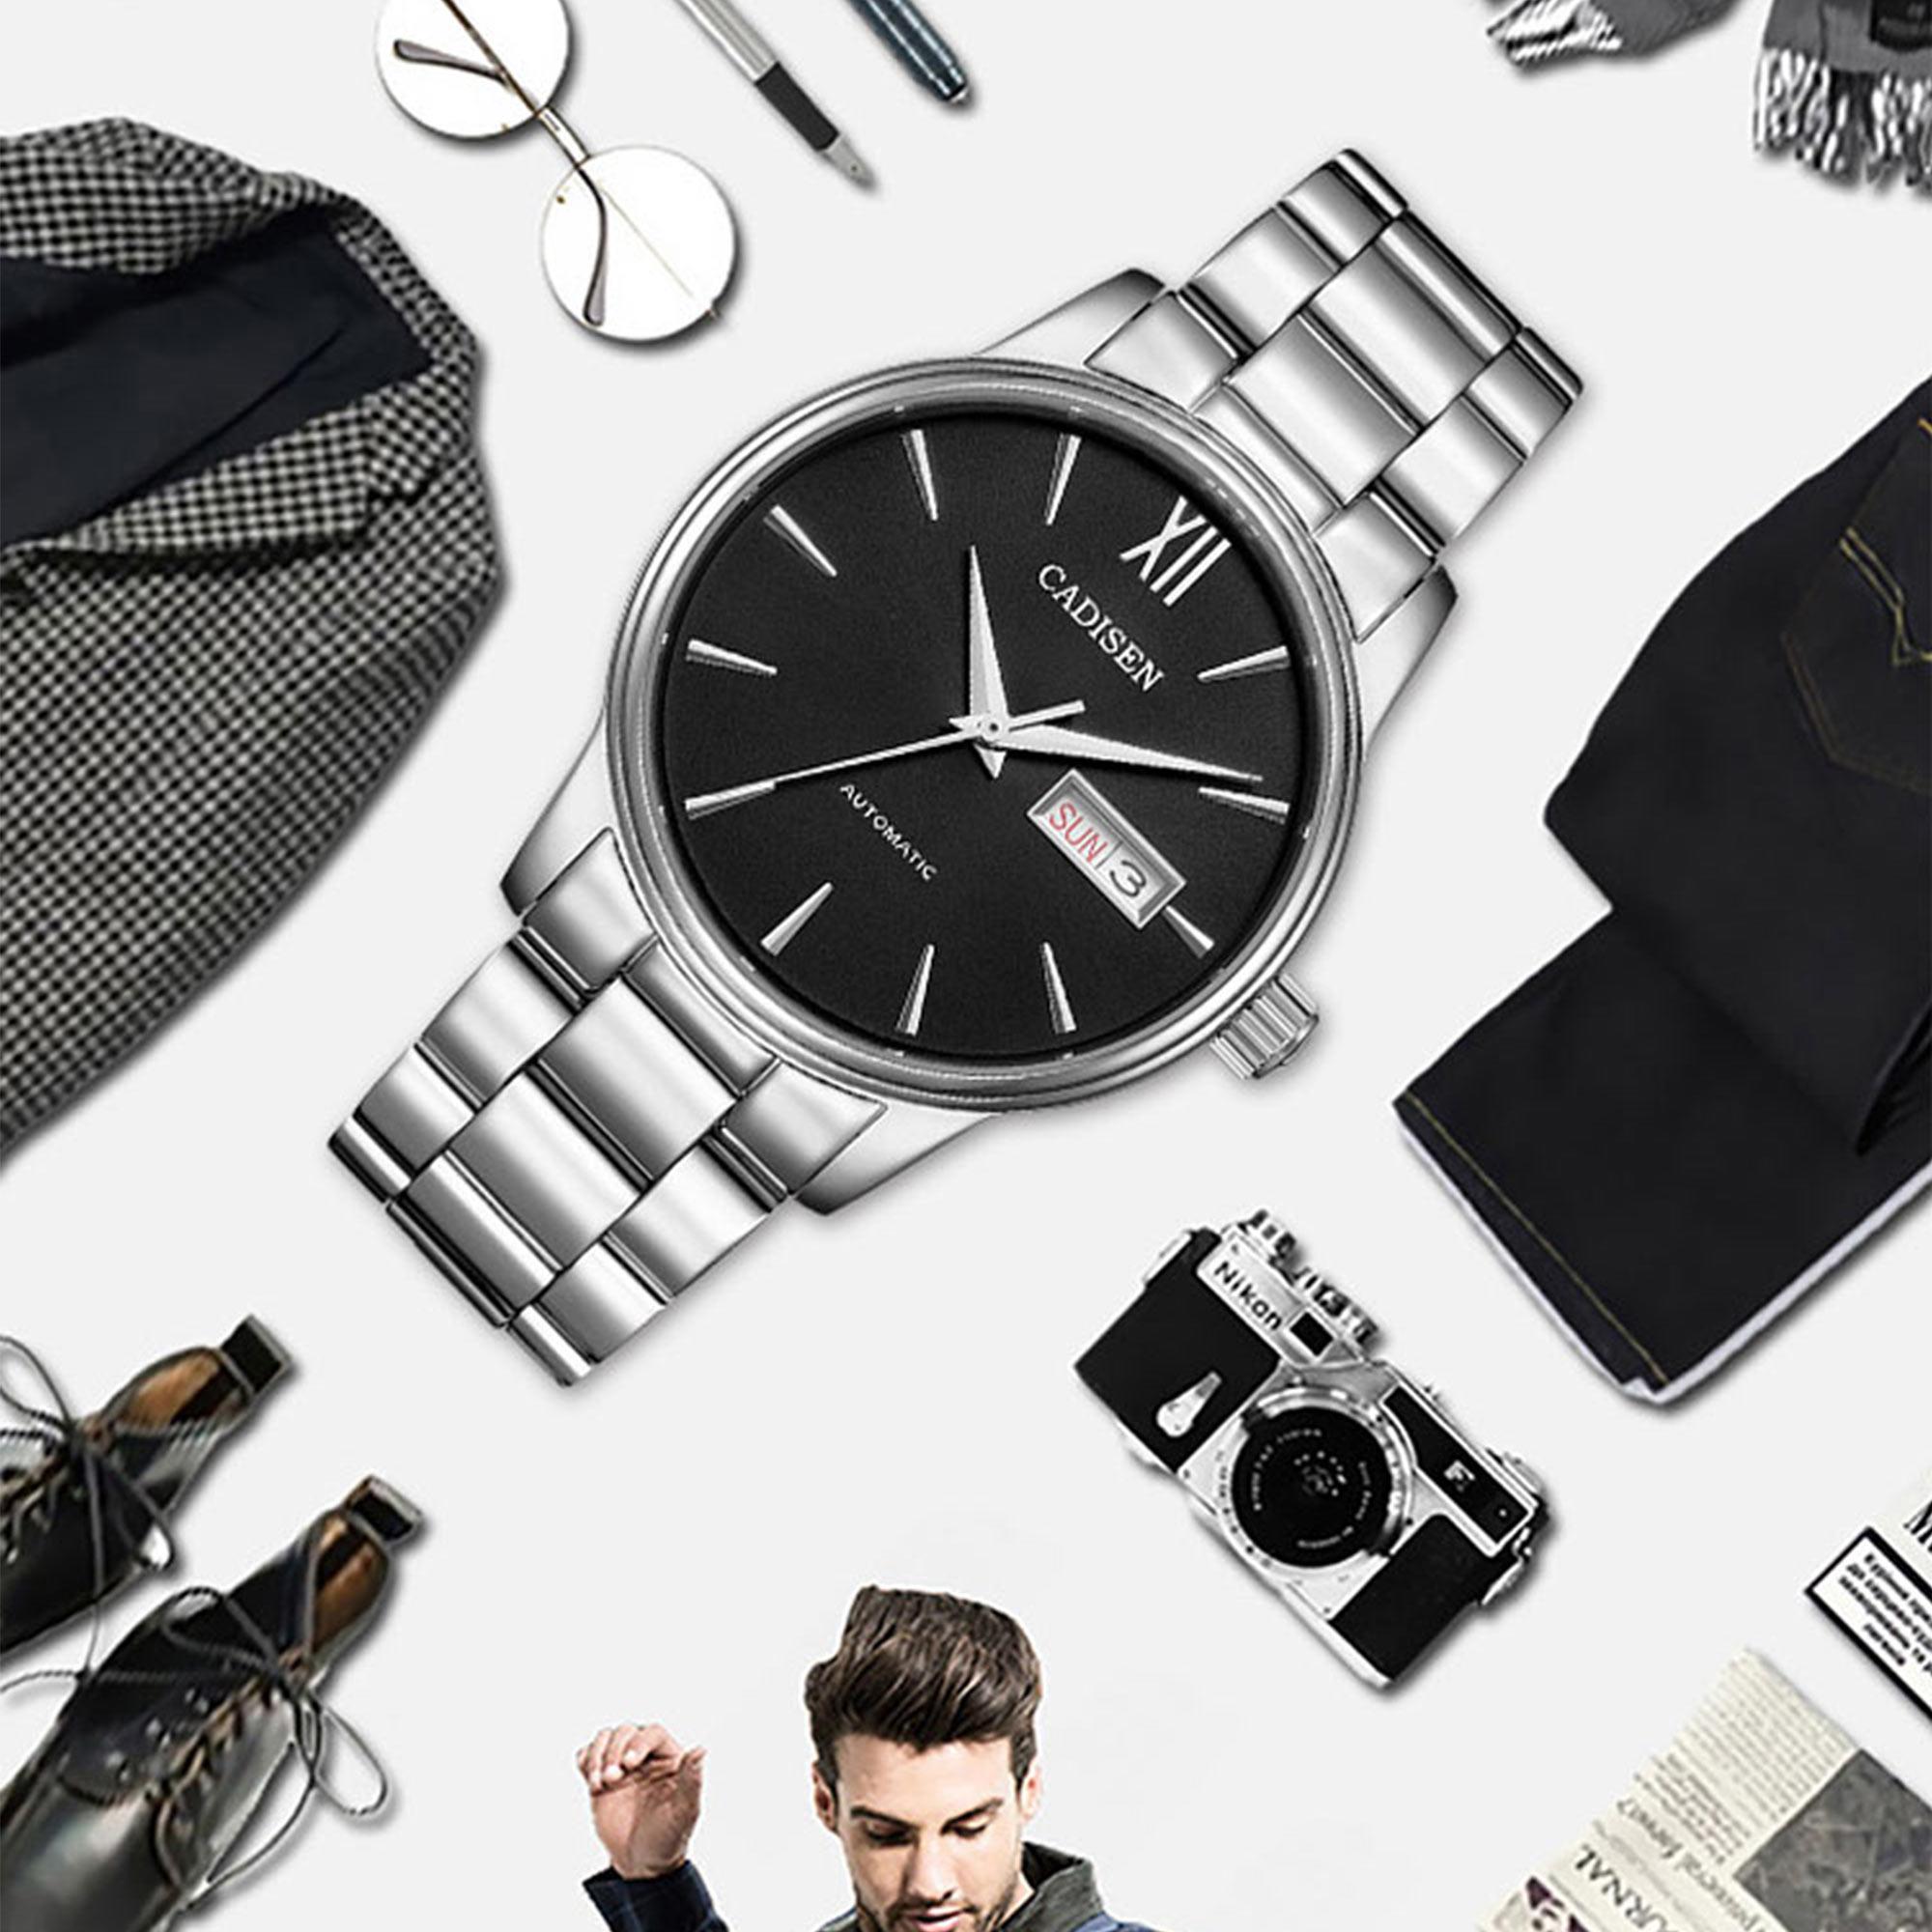 H7b09004efd9a4bf9bf8a88921ecf08e1O CADISEN Men Watch Automatic Mechanical Watches Role Date Week Top Luxury Brand Japan NH36A Wrist watch Clock Relogio Masculino